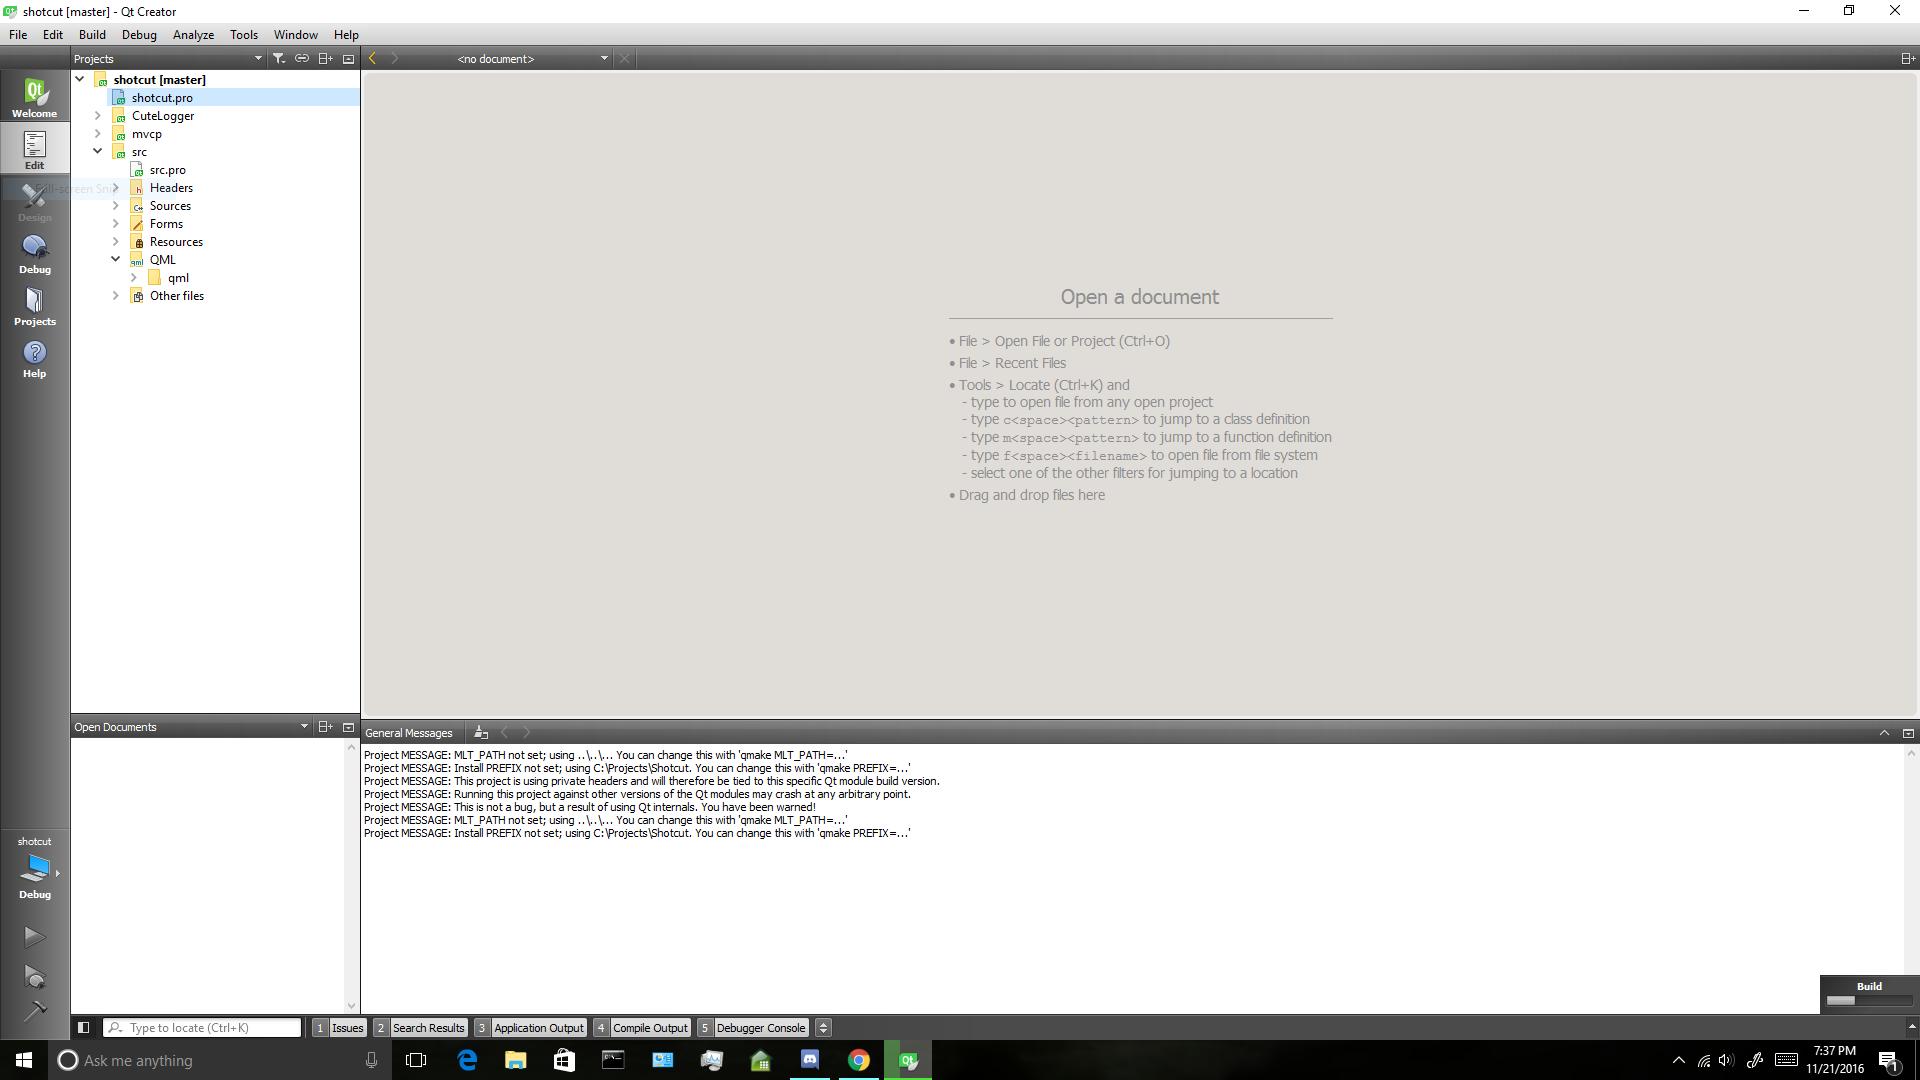 Shotcut - How To Use the Windows SDK